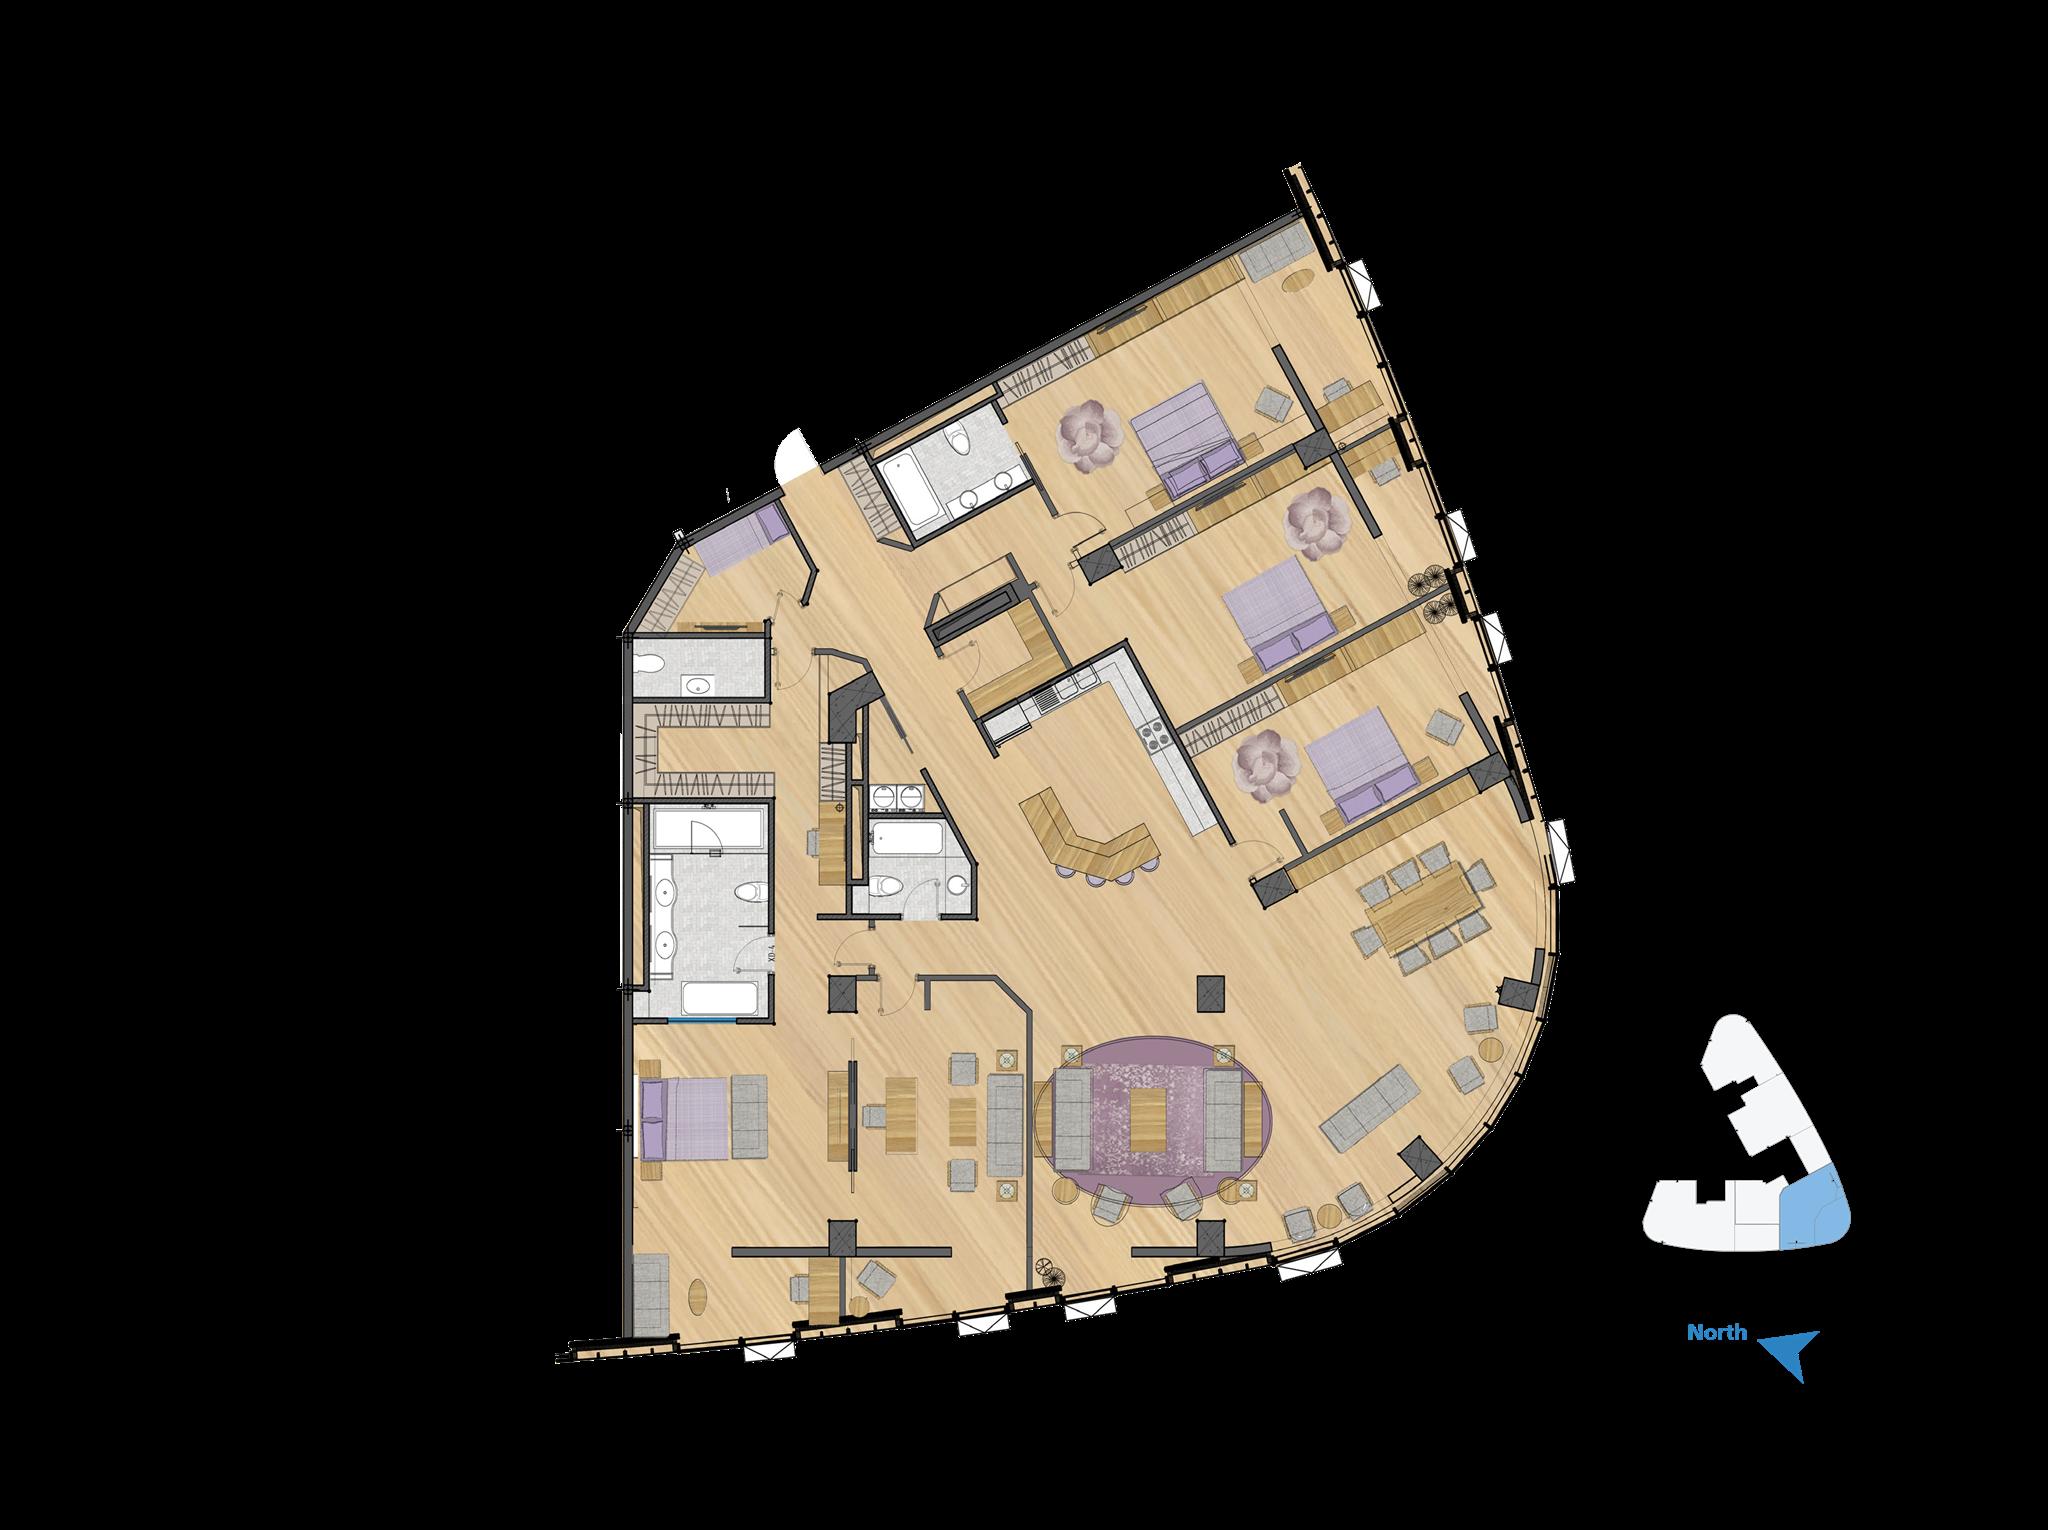 Residential - Type P